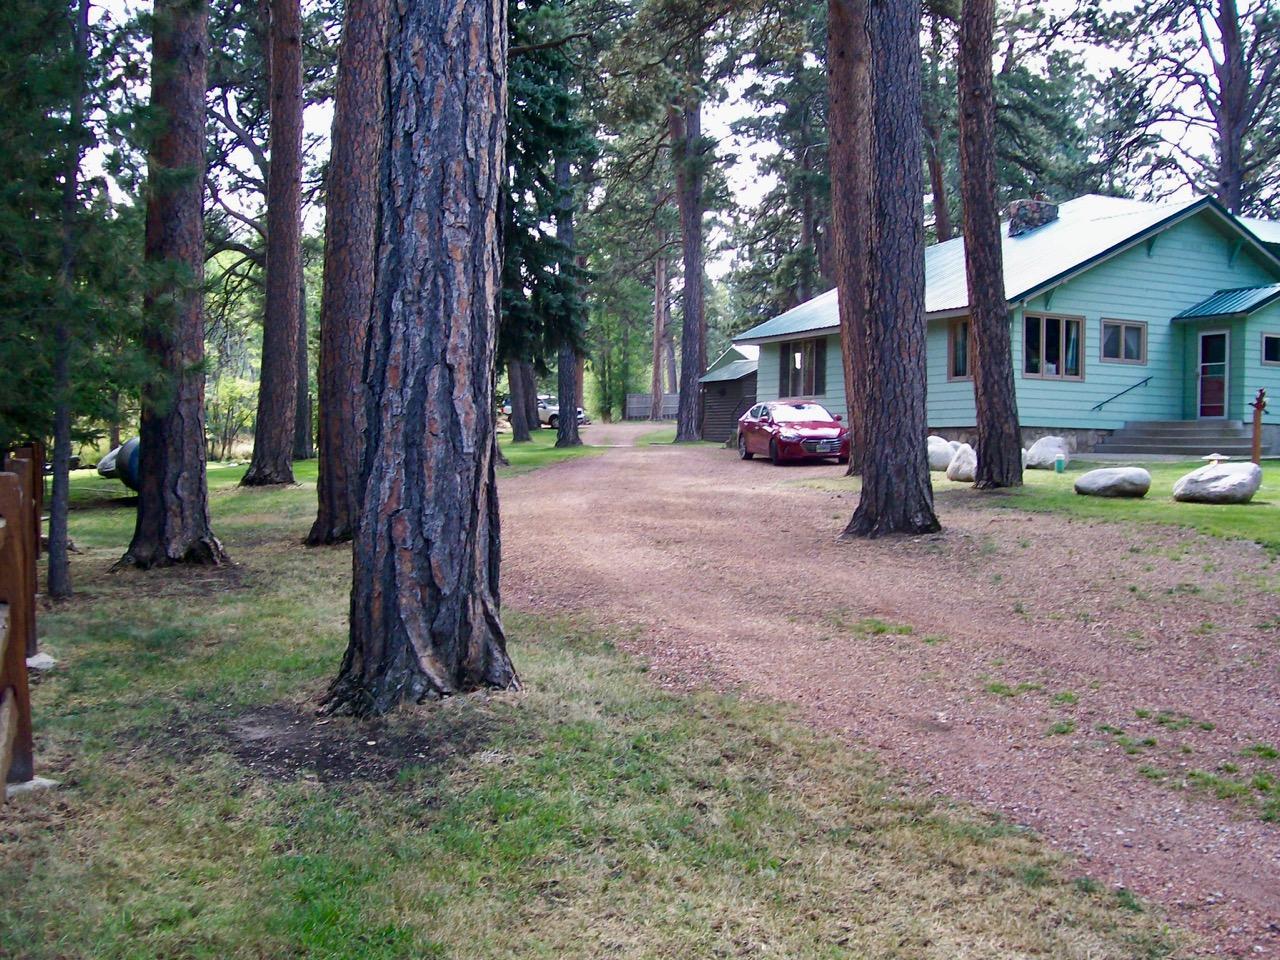 184 Fish Hatchery Road, Story, Wyoming 82842, 3 Bedrooms Bedrooms, ,3 BathroomsBathrooms,Residential,For Sale,Fish Hatchery,19-281